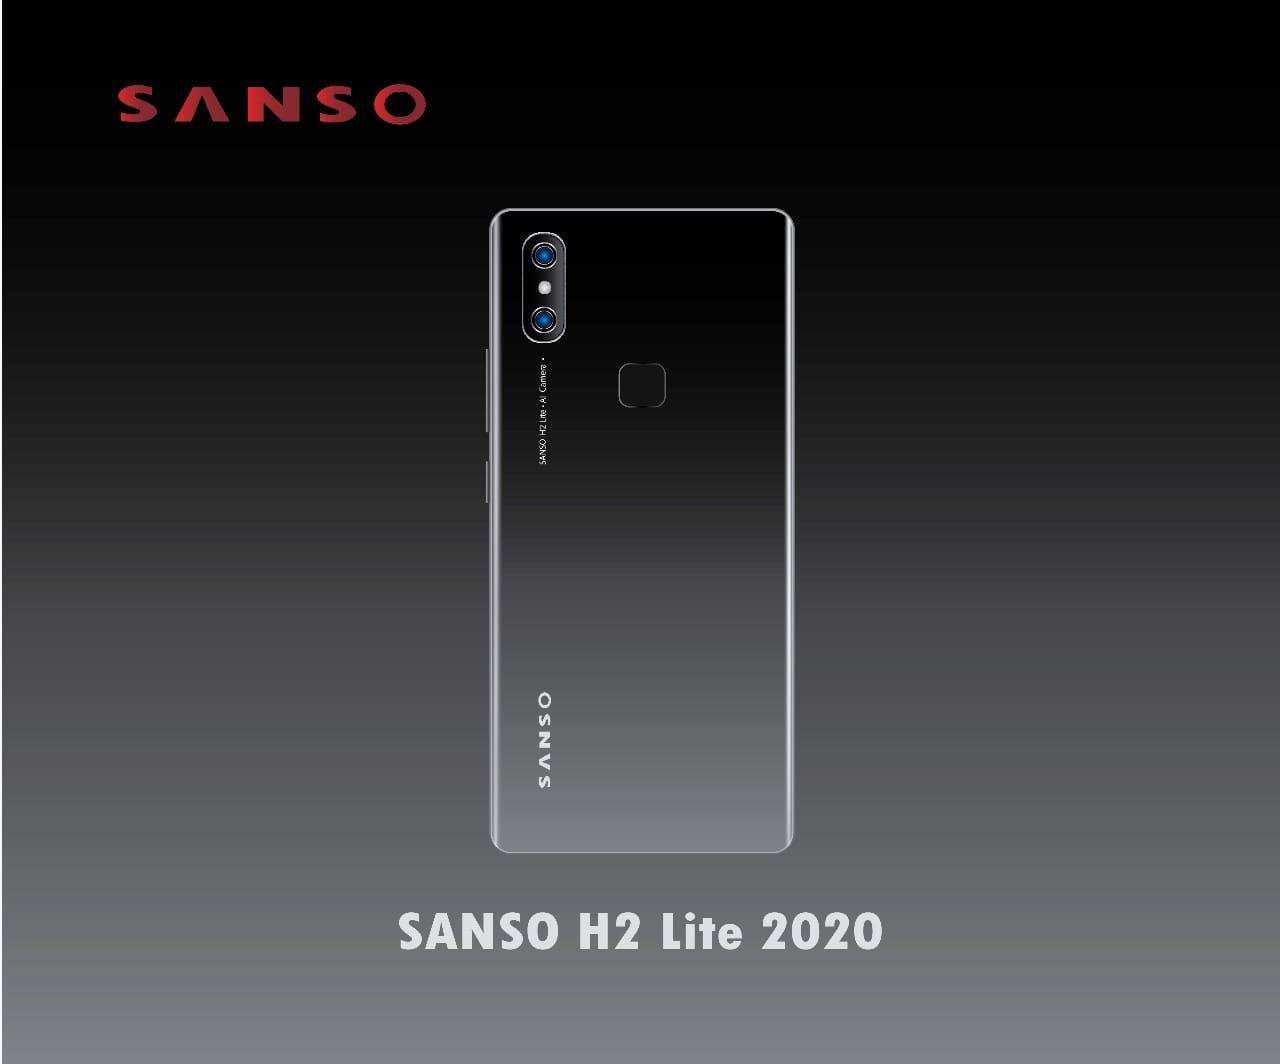 #SansoMobile #SansoMobiles #Sanso #Smartphone #Smartphones #LowendSmartphone #EntryLevel #MTK #A22 #H2Lite #SansoH2Lite #MediaTek #Telecom #newseries #SansoTechnologies